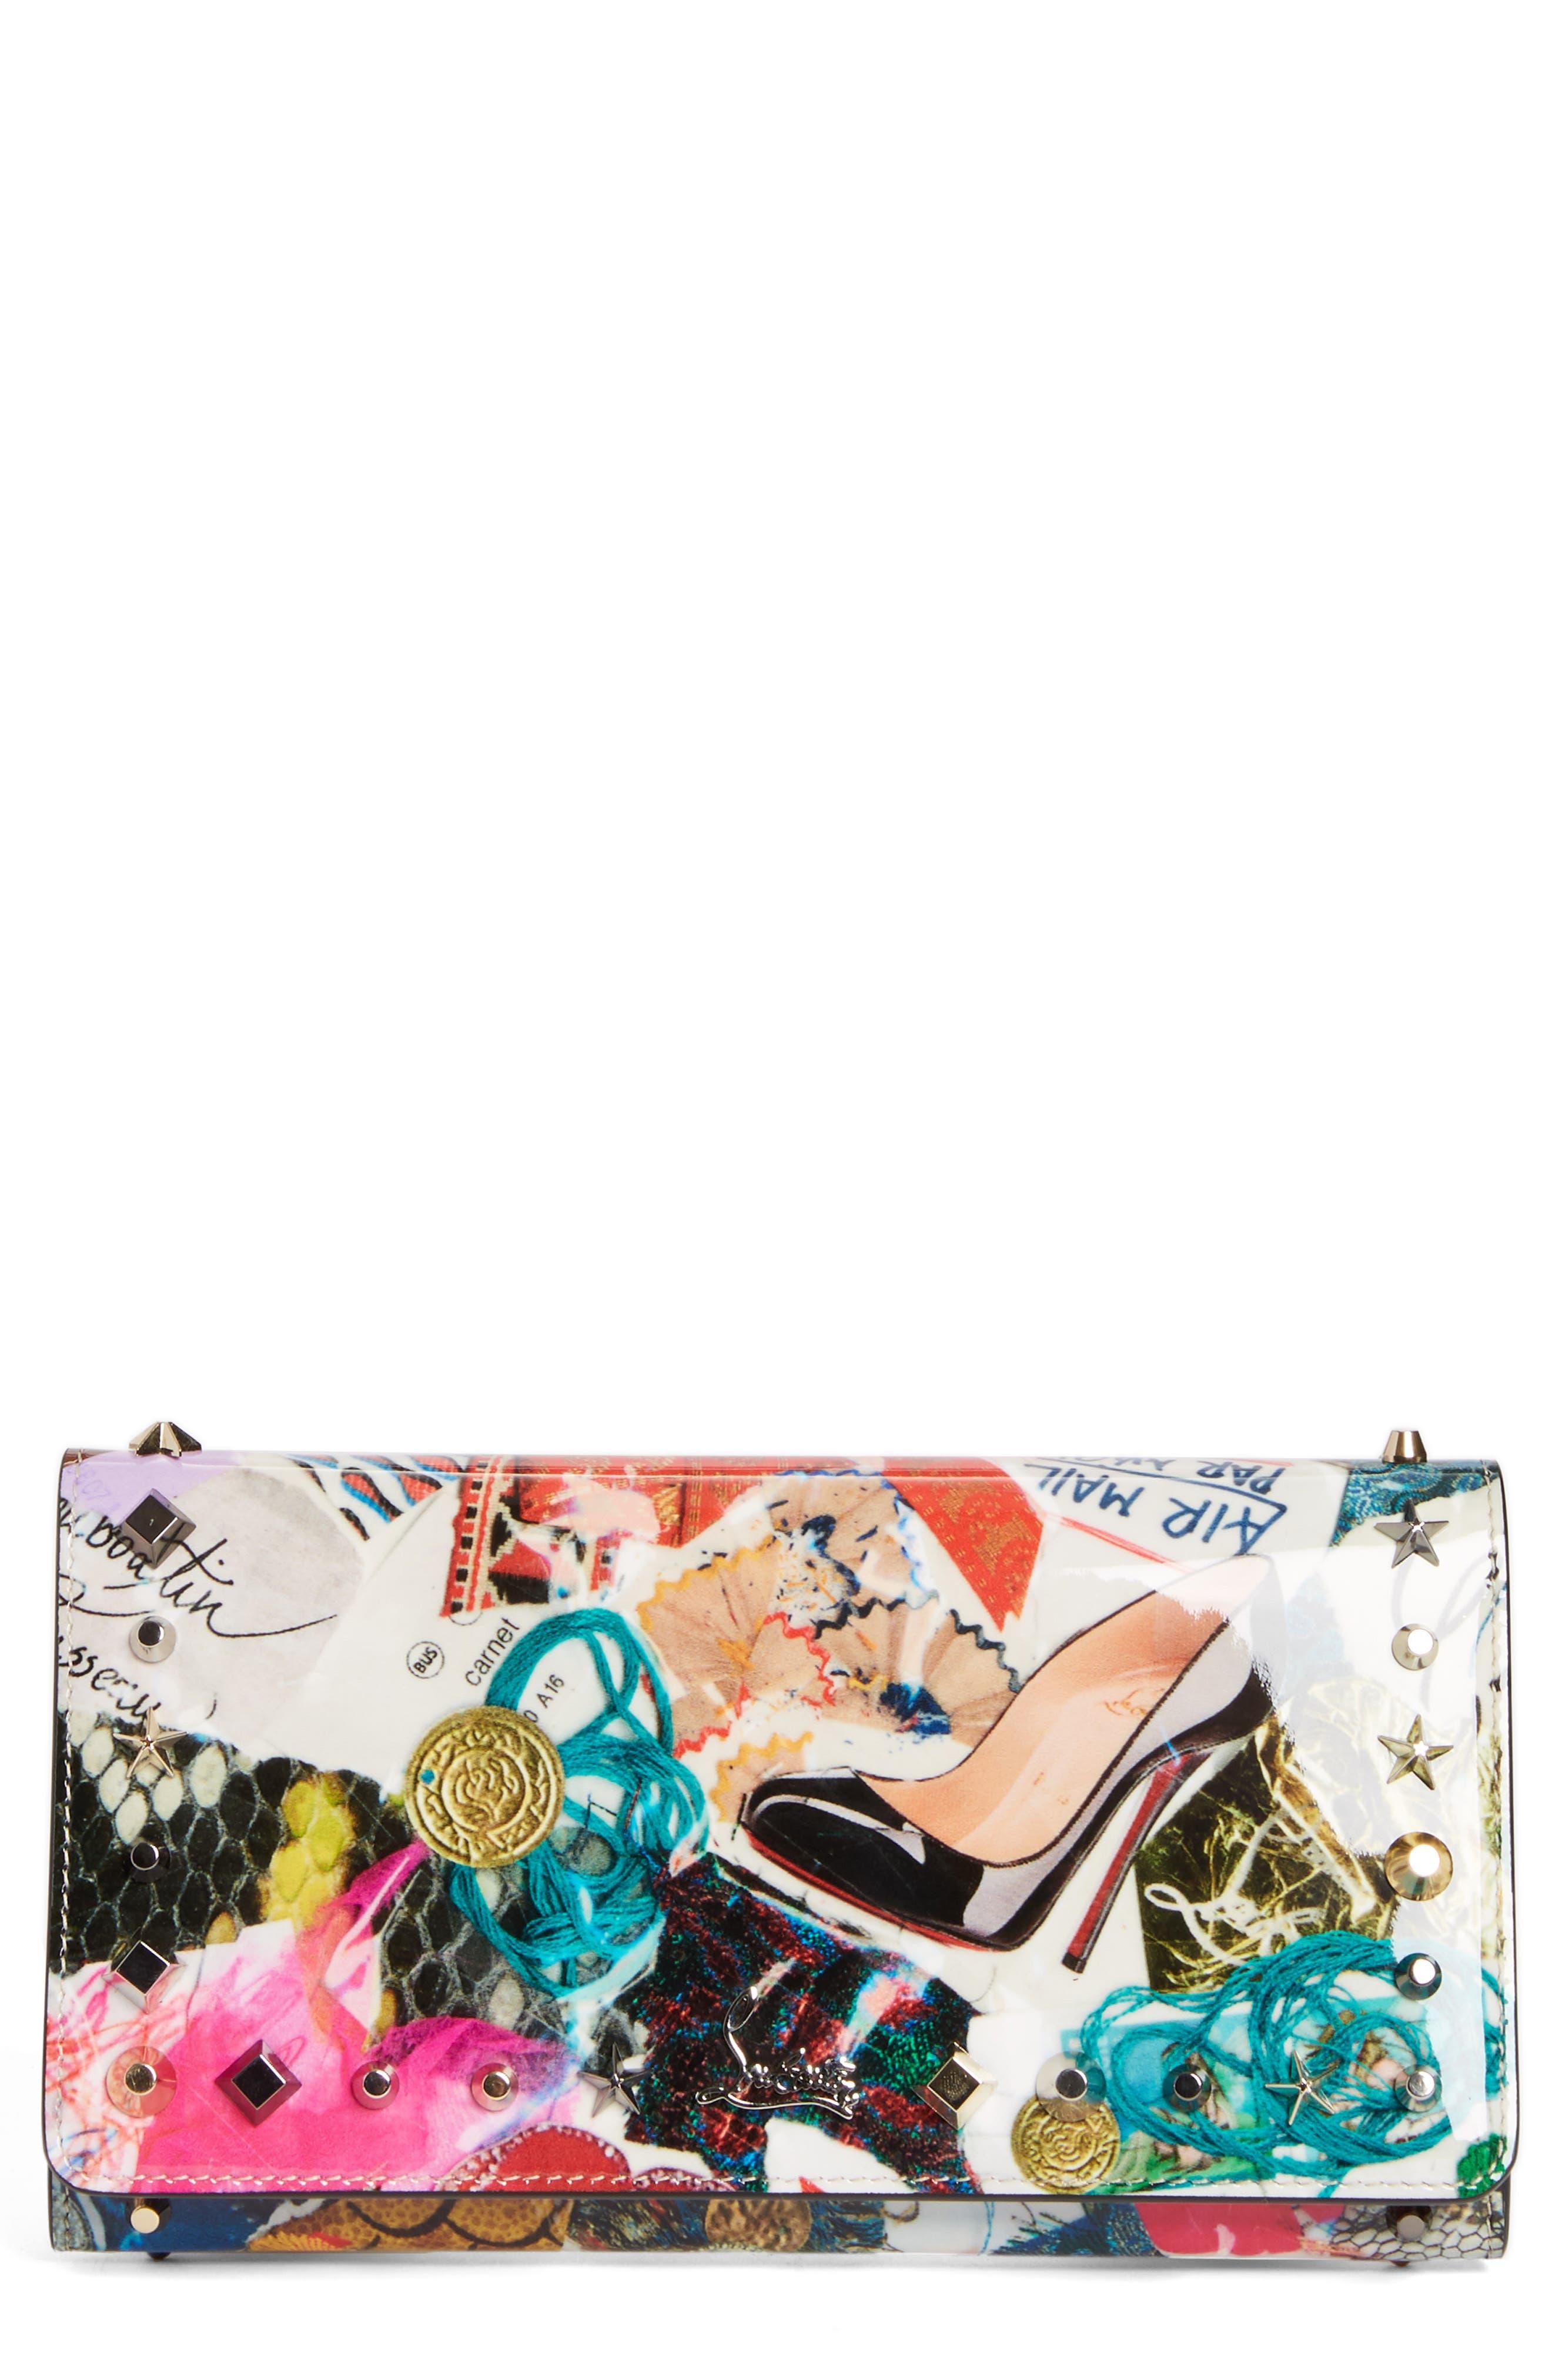 Christian Louboutin Macaron Trash Print Leather Wallet